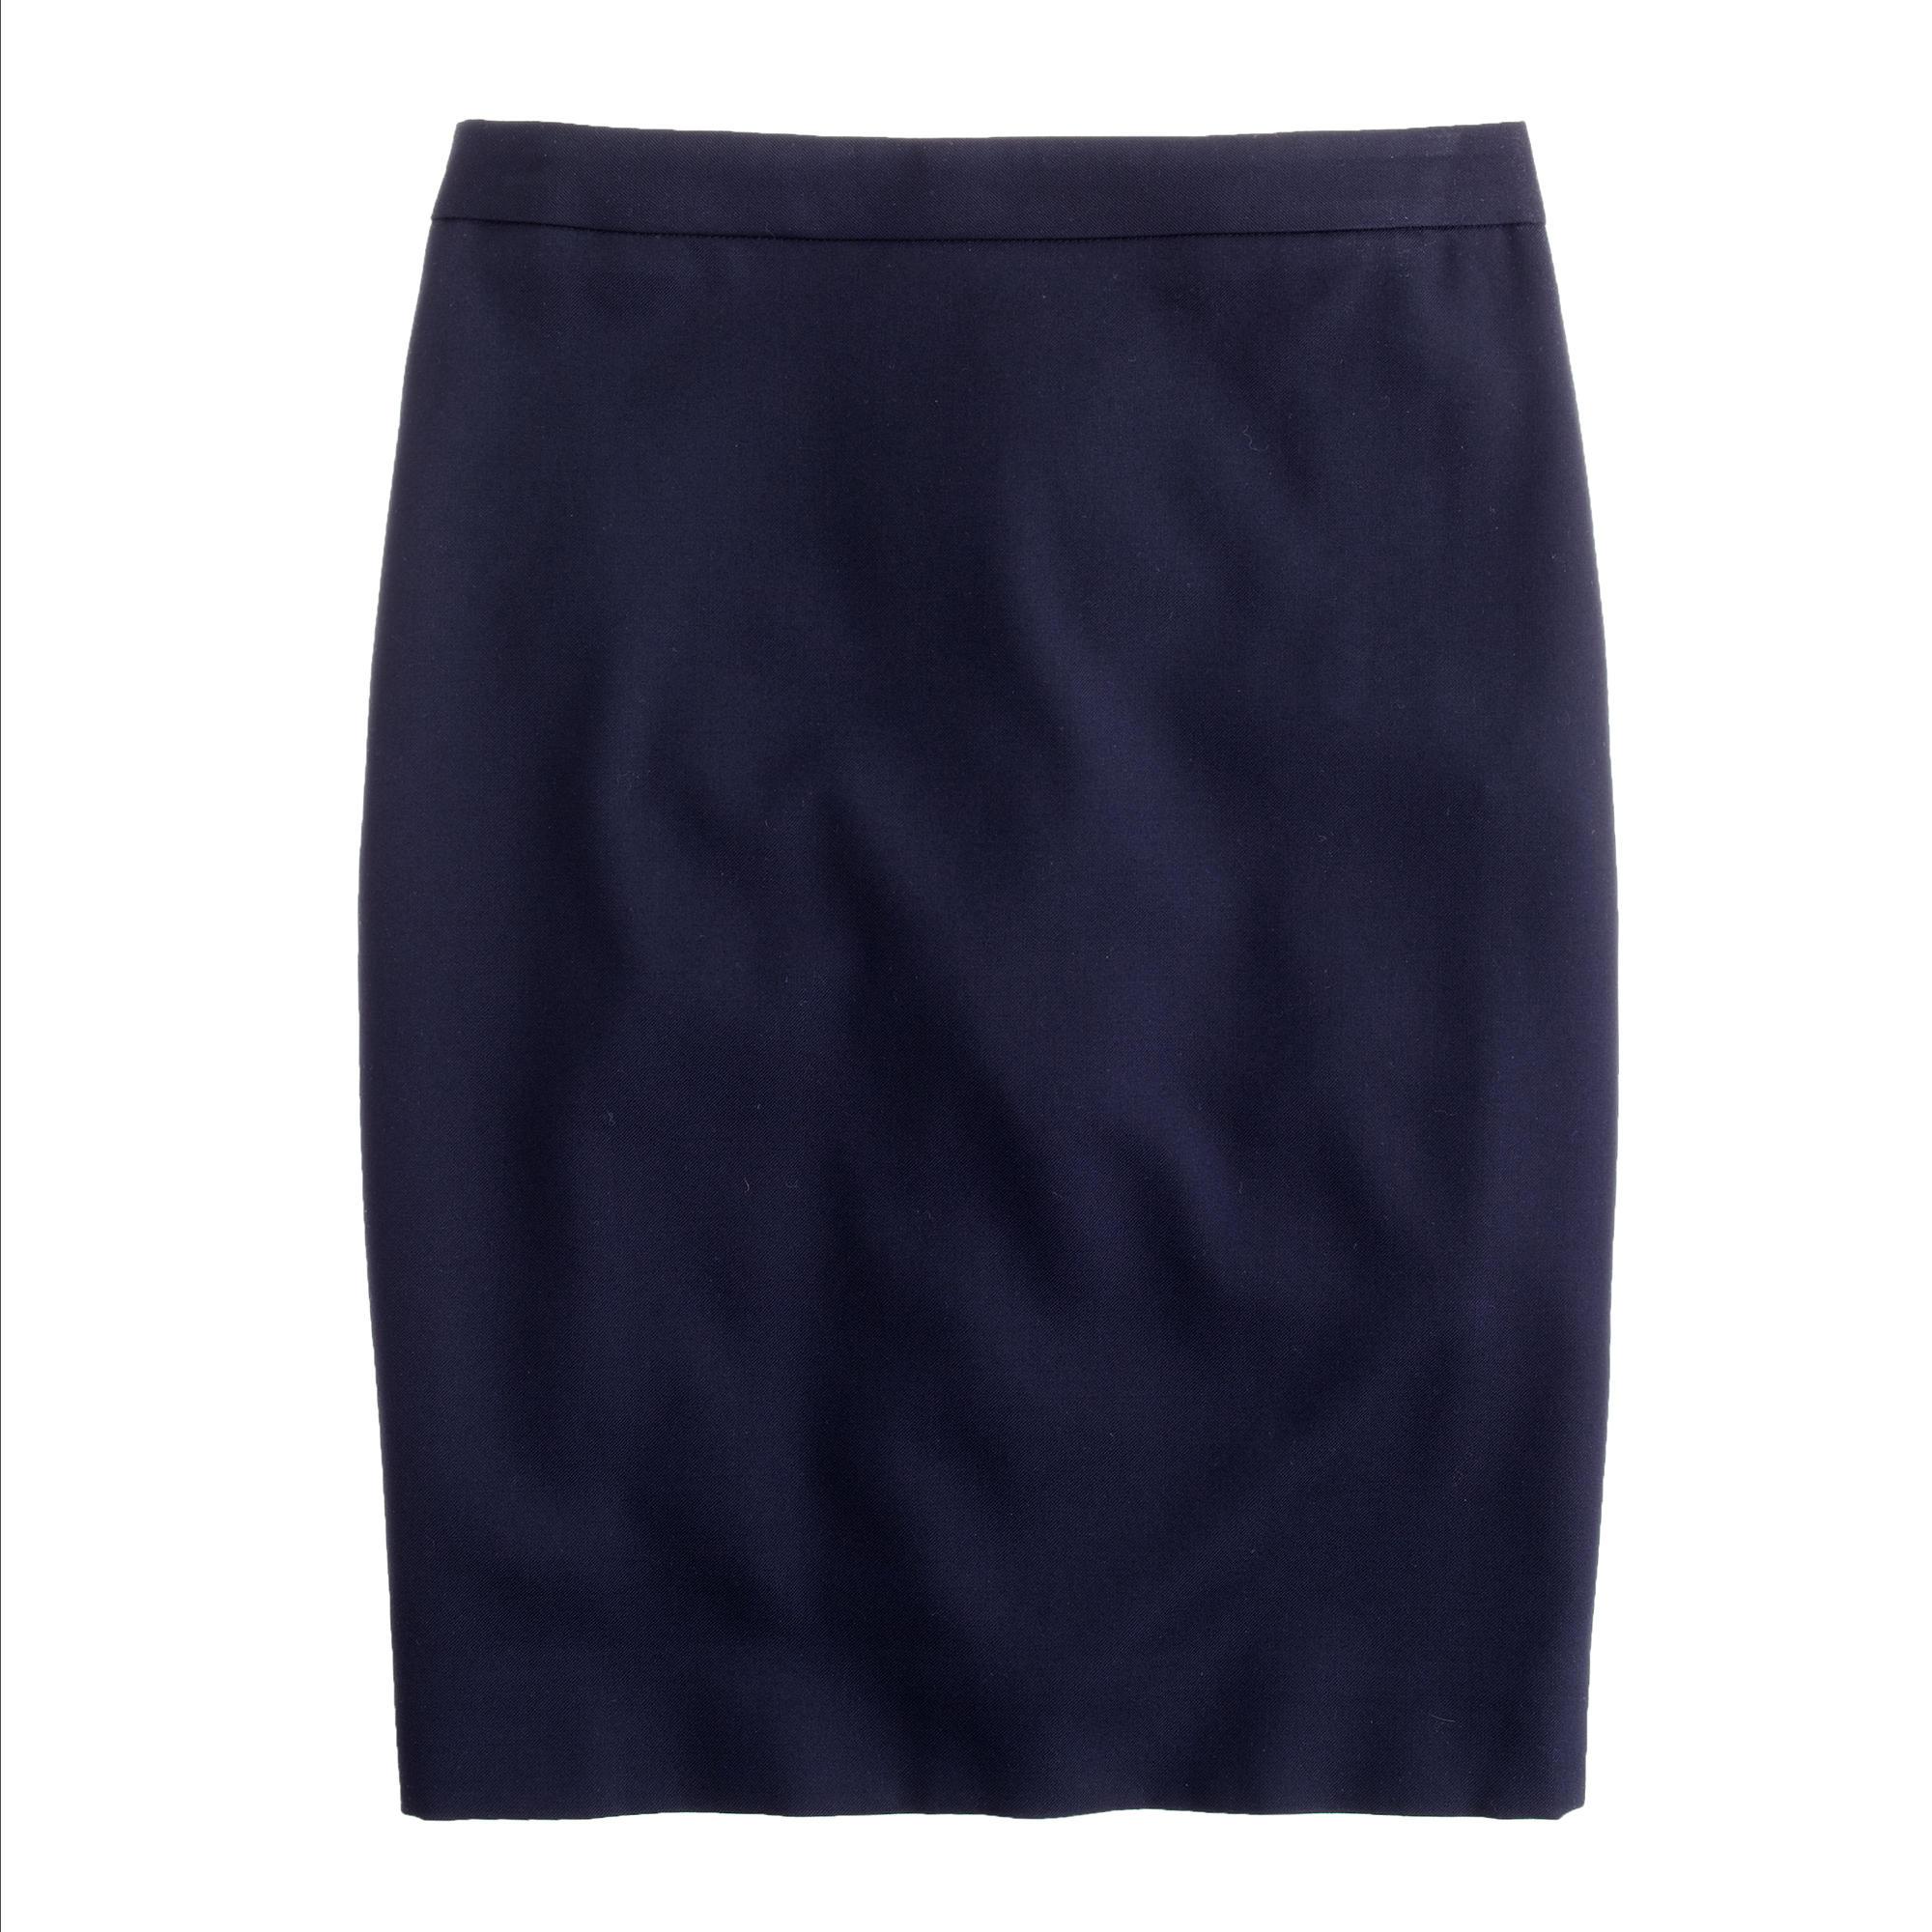 j crew pencil skirt in 120s wool in blue lyst